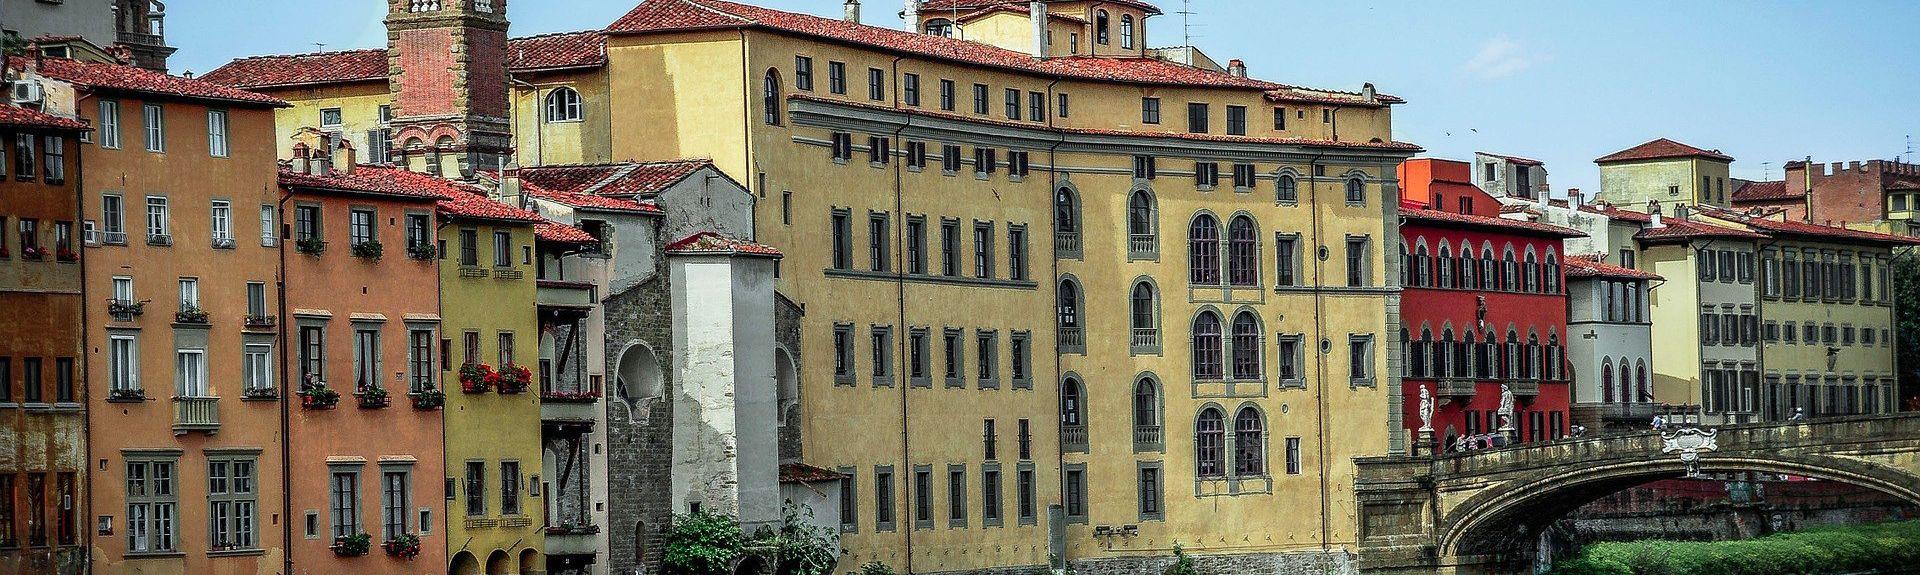 Lungarno del Tempio, Florens, Toscana, Italien